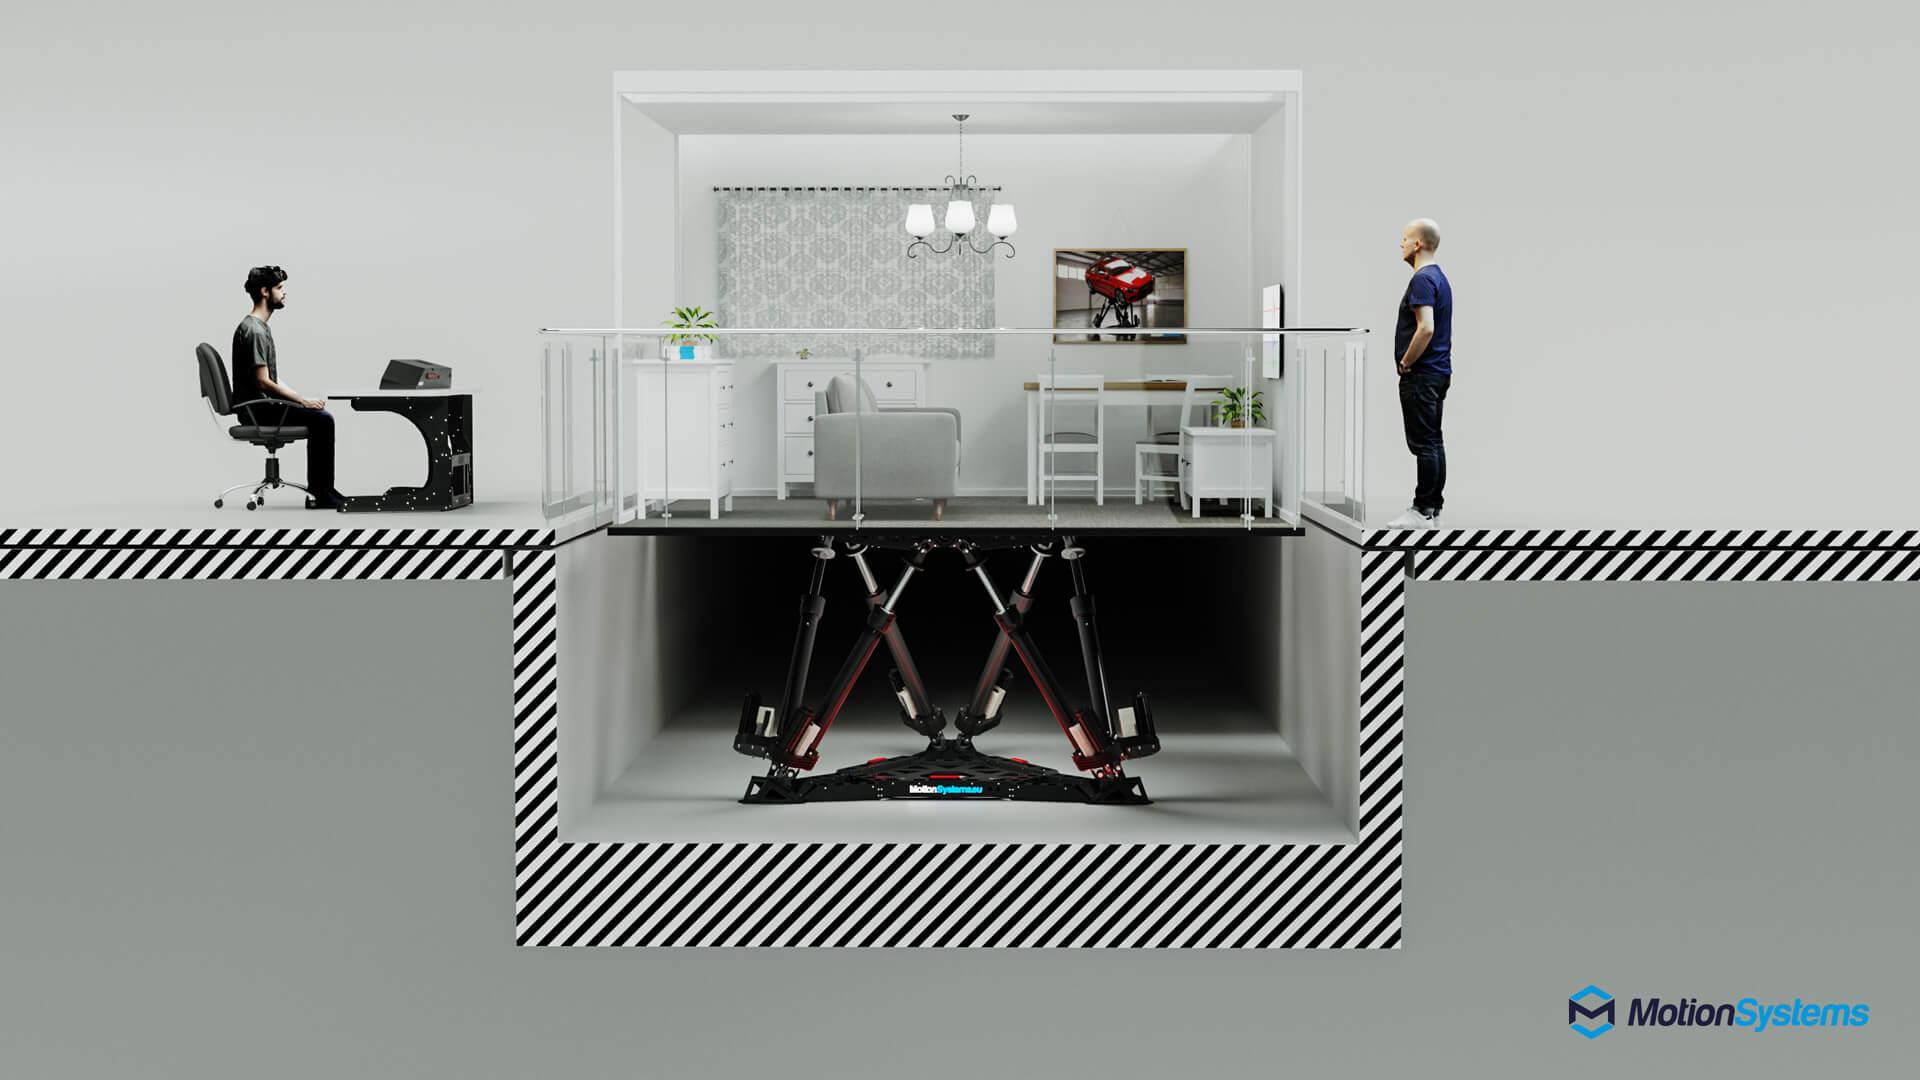 Earthquake Simulator Room